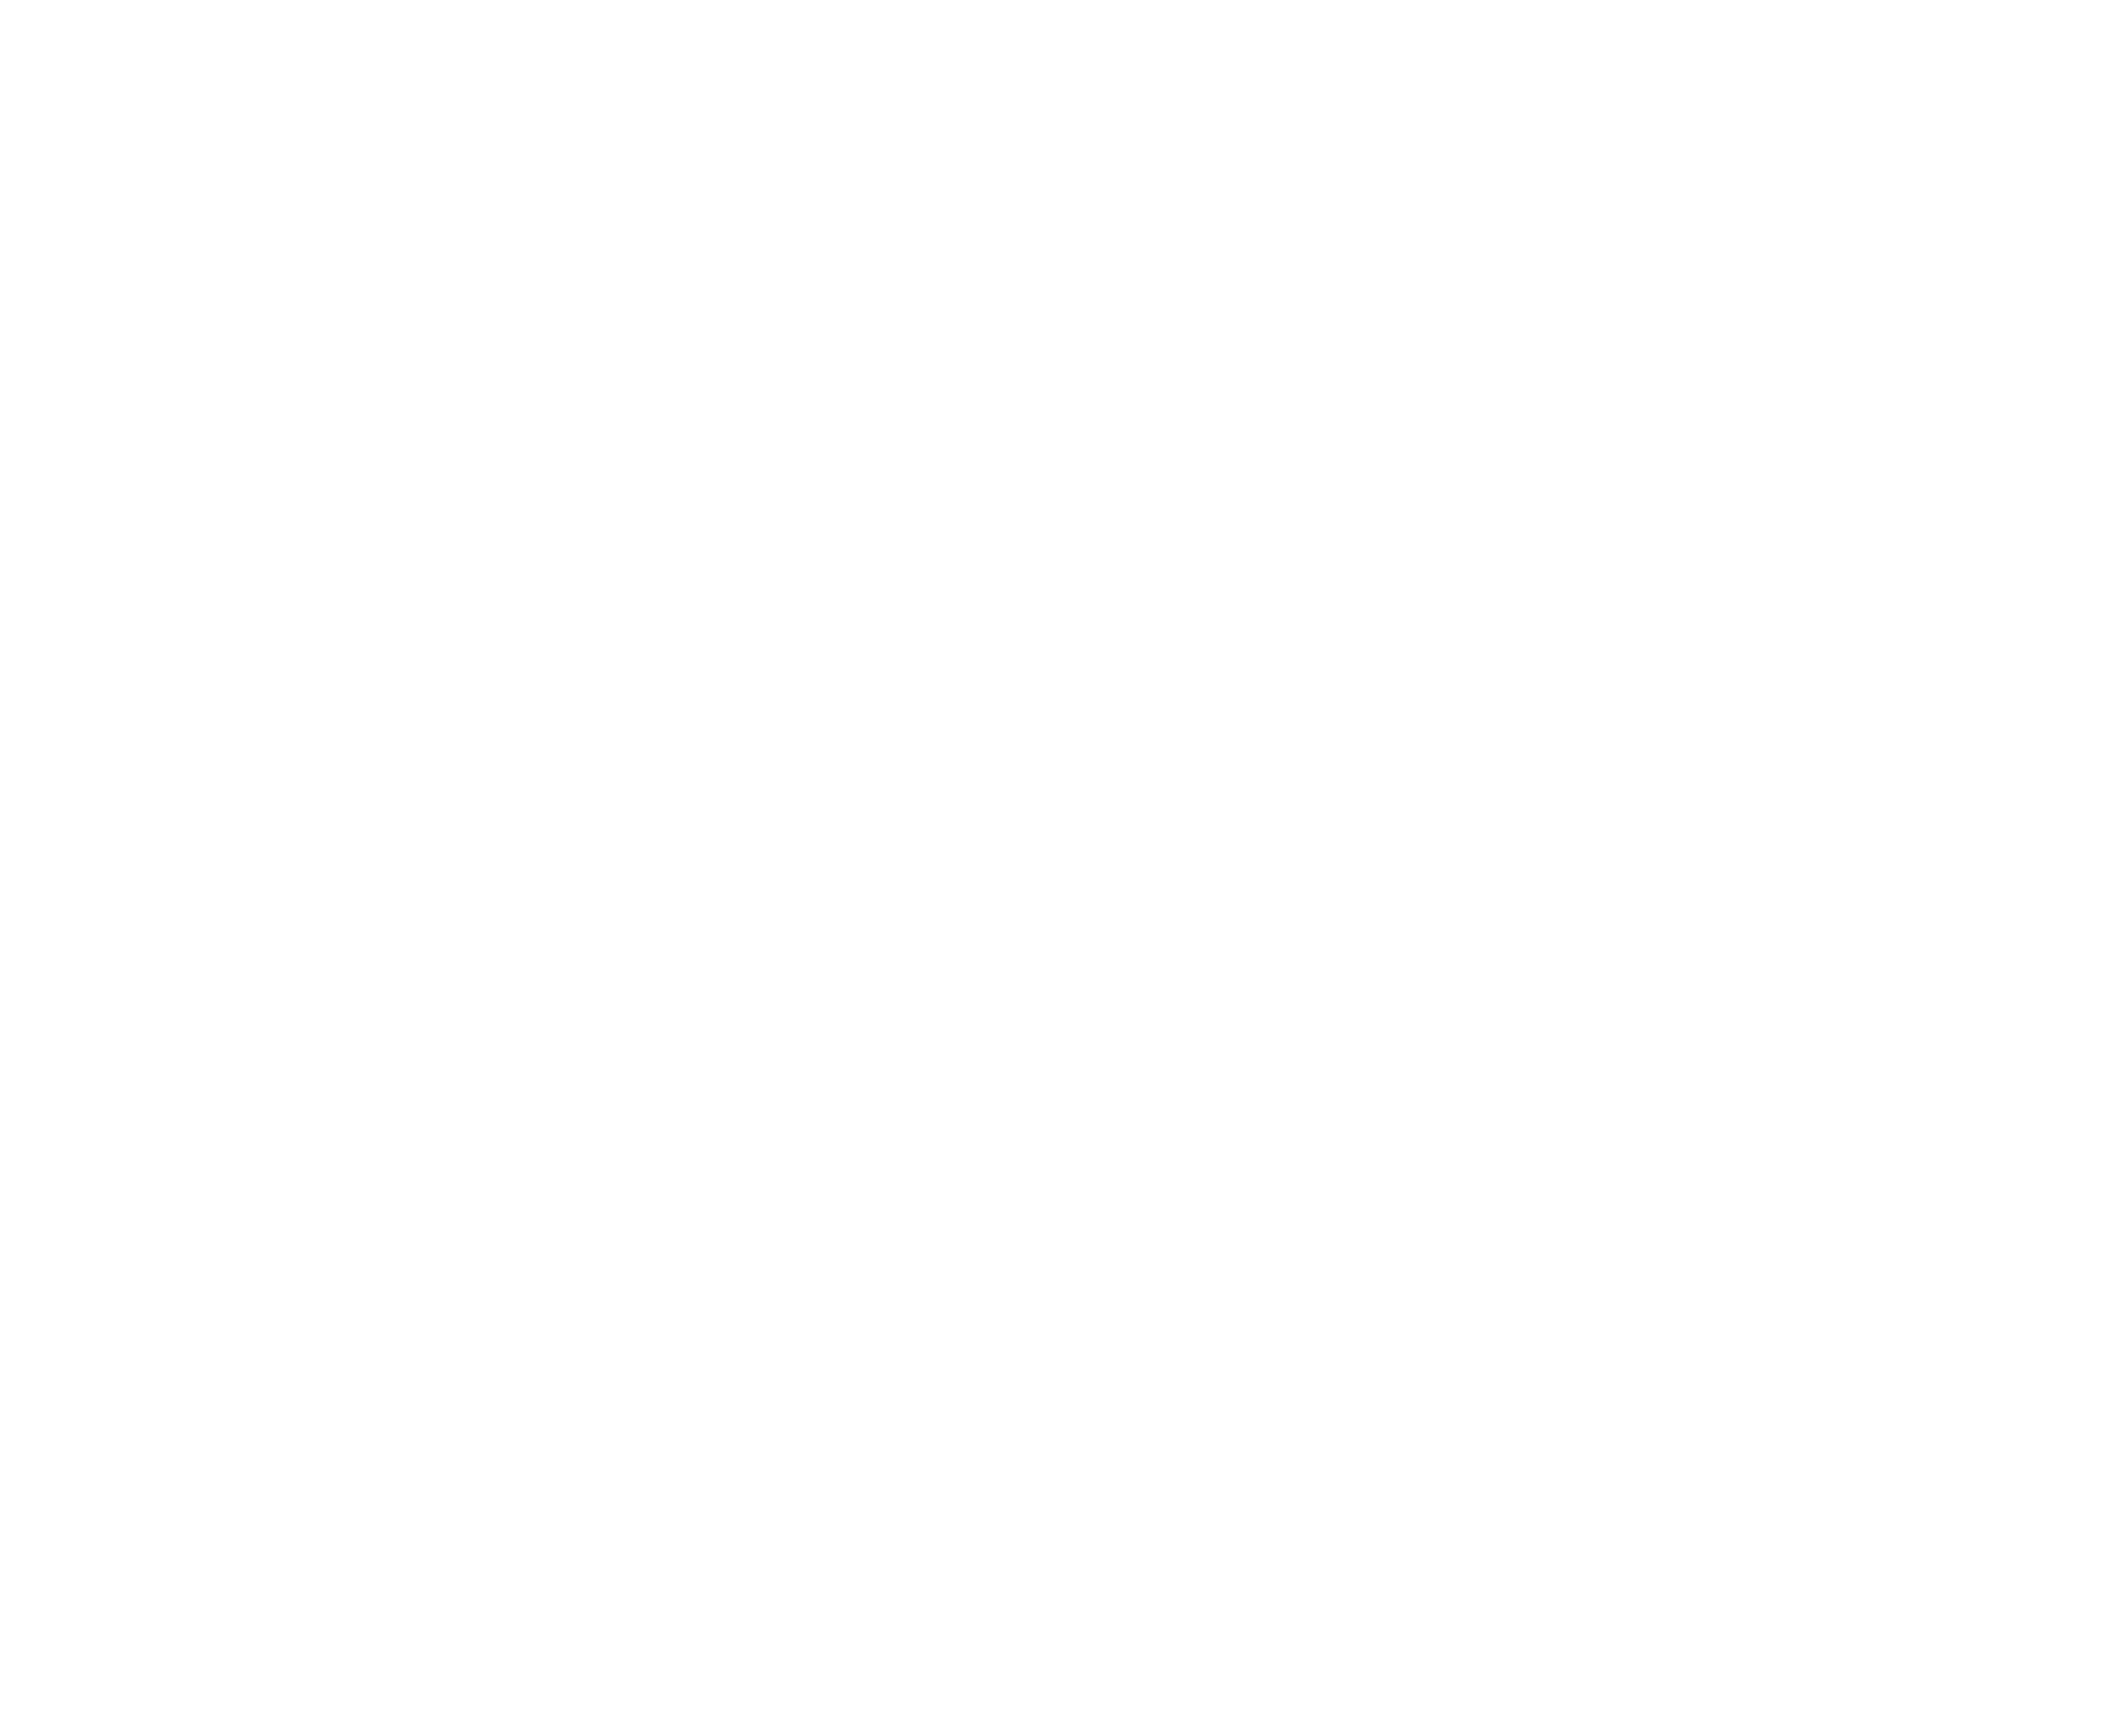 16OFF_OfficialSelecton_logoWHITE.png